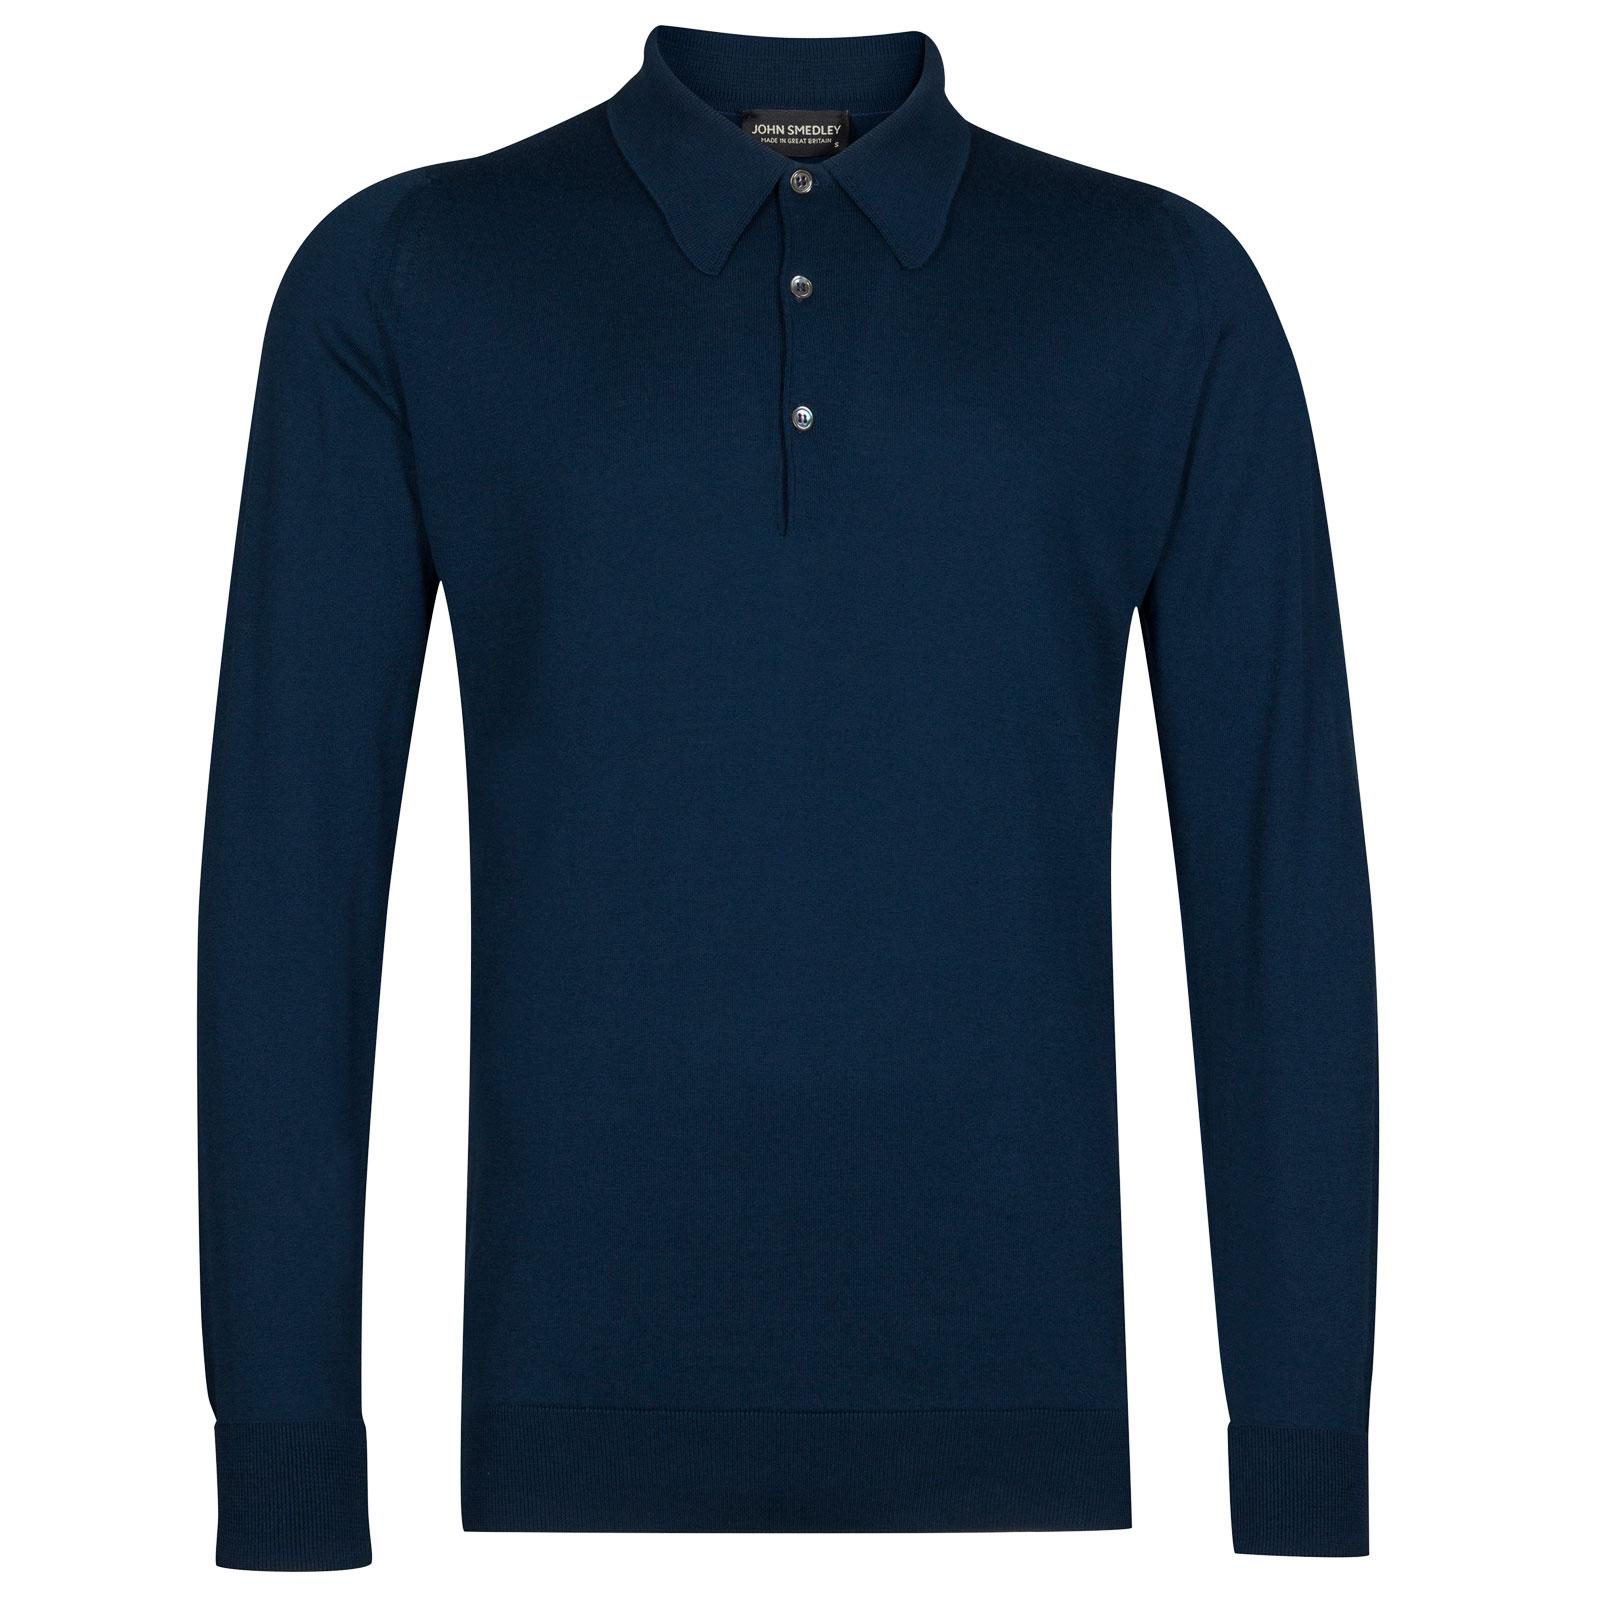 John Smedley finchley Sea Island Cotton Shirt in Indigo-XS